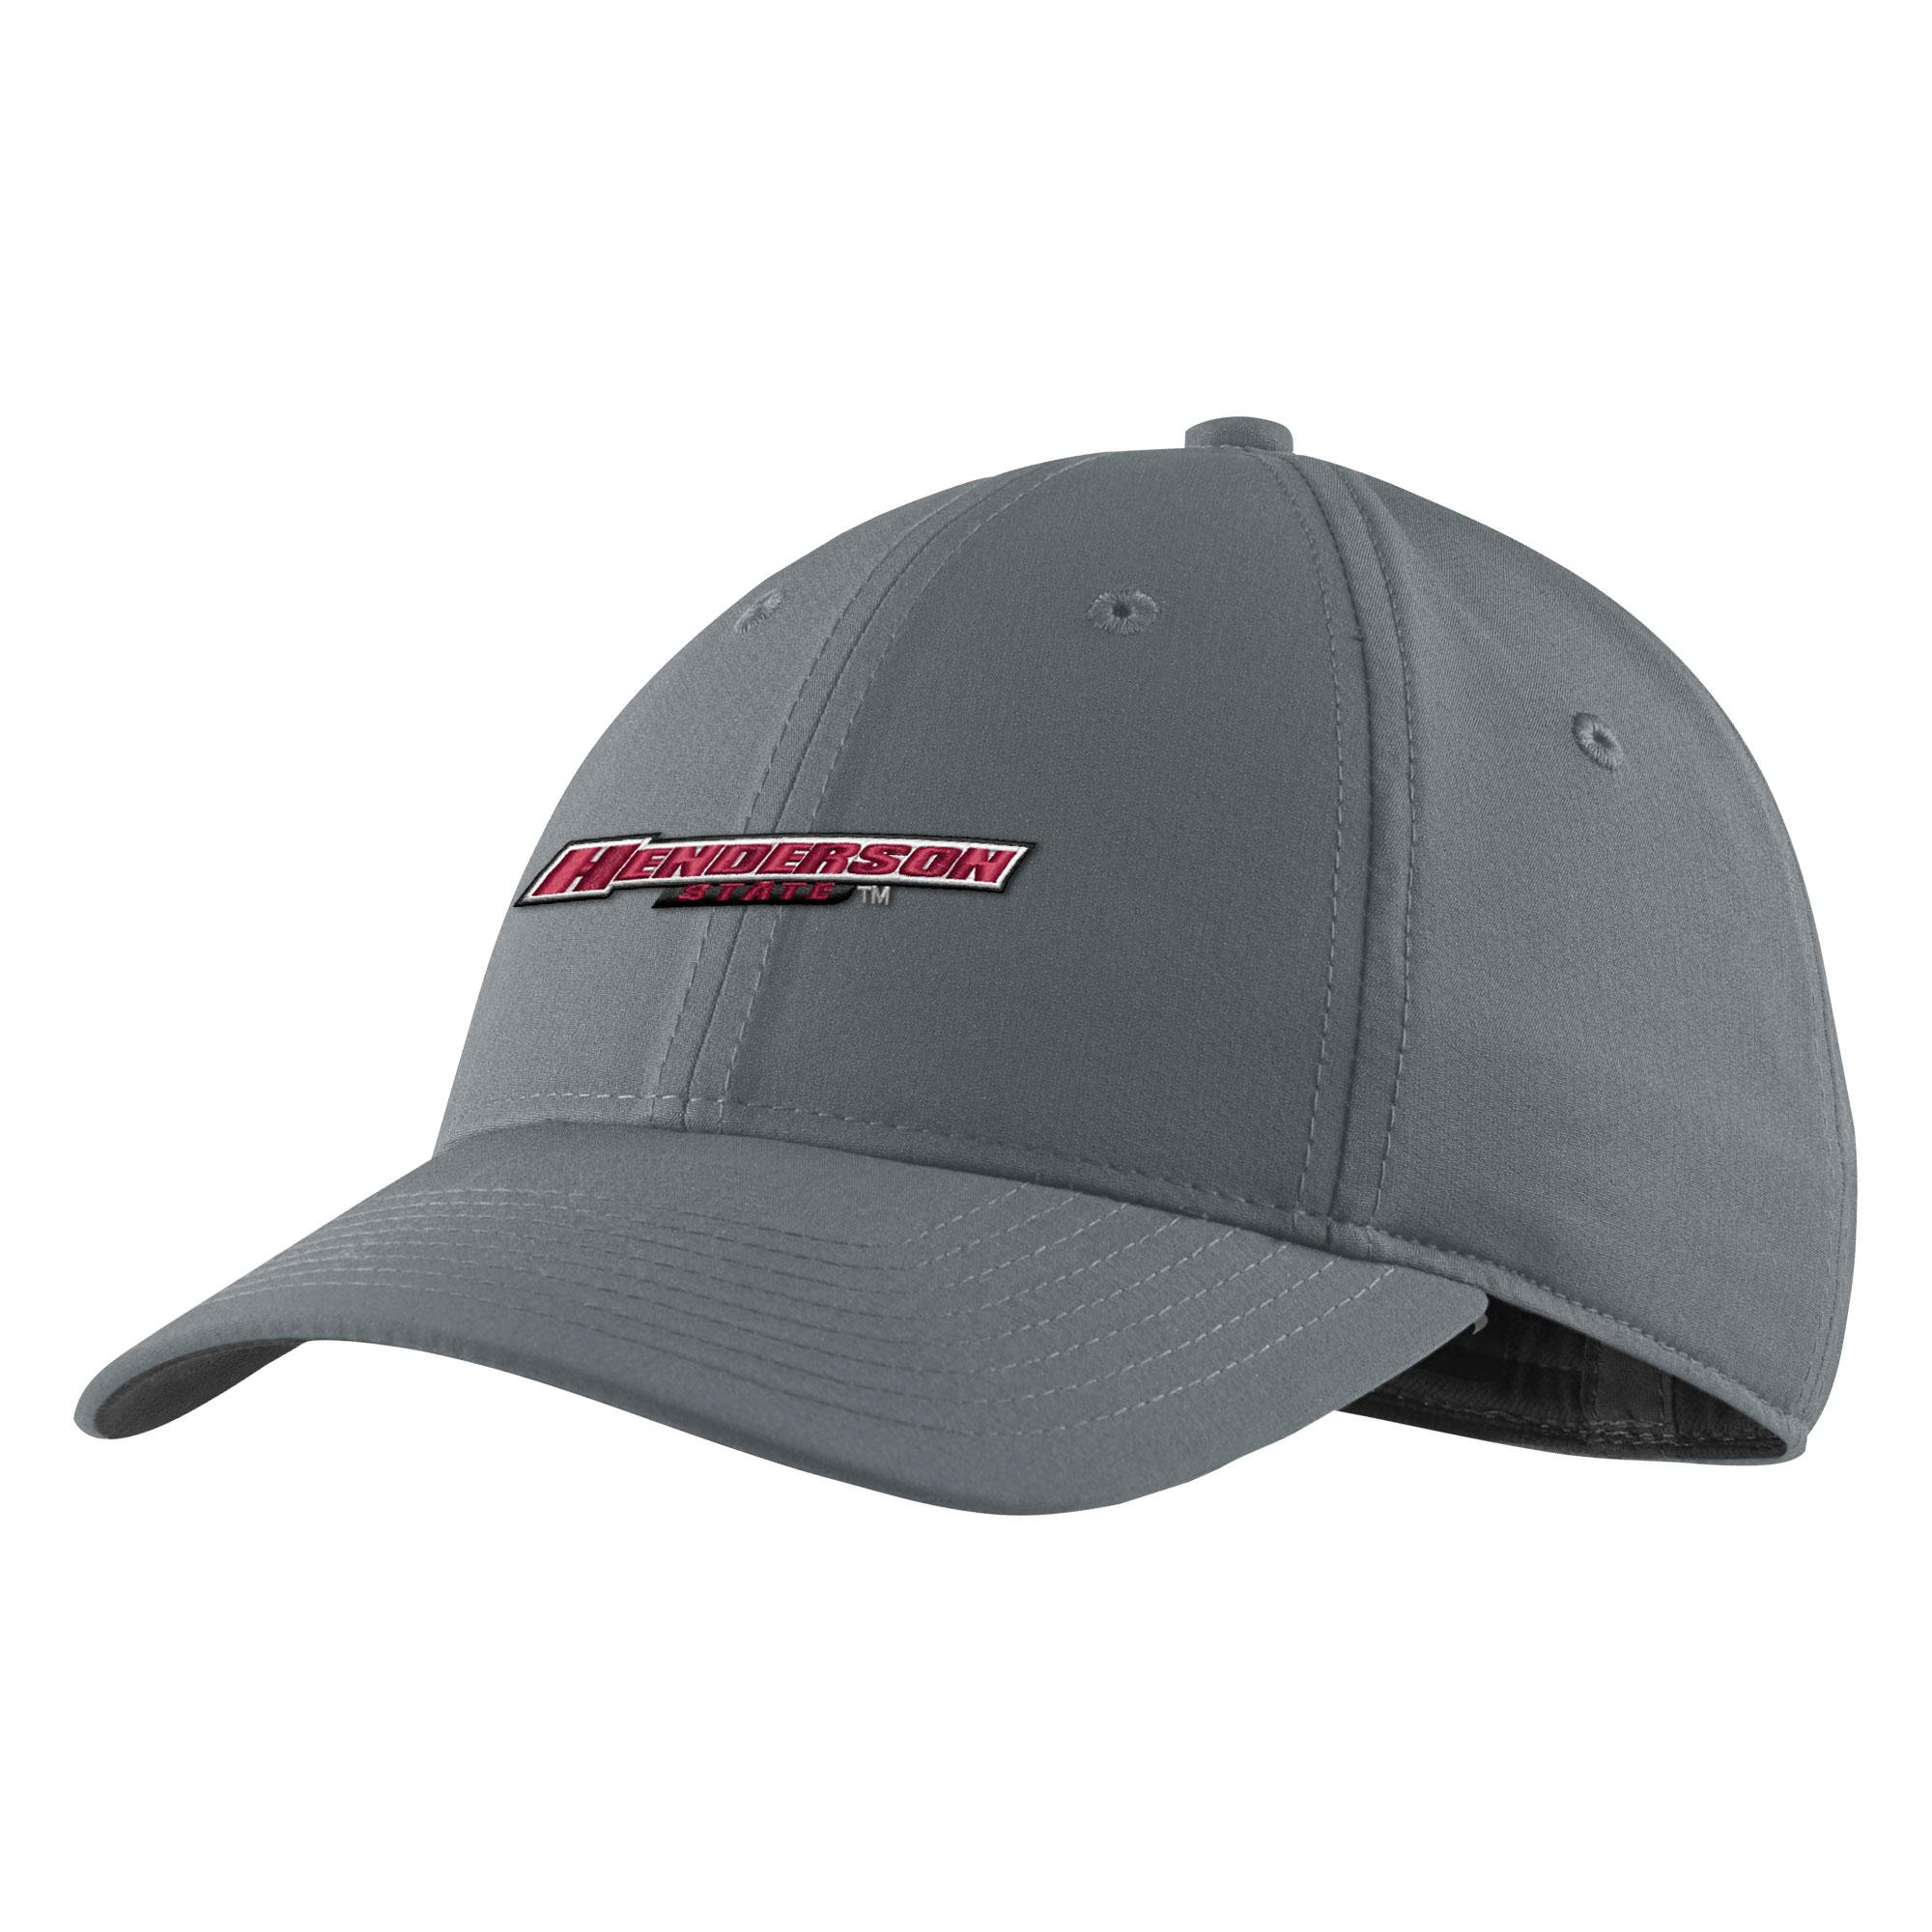 Henderson State Swoosh Flex Nike Hat